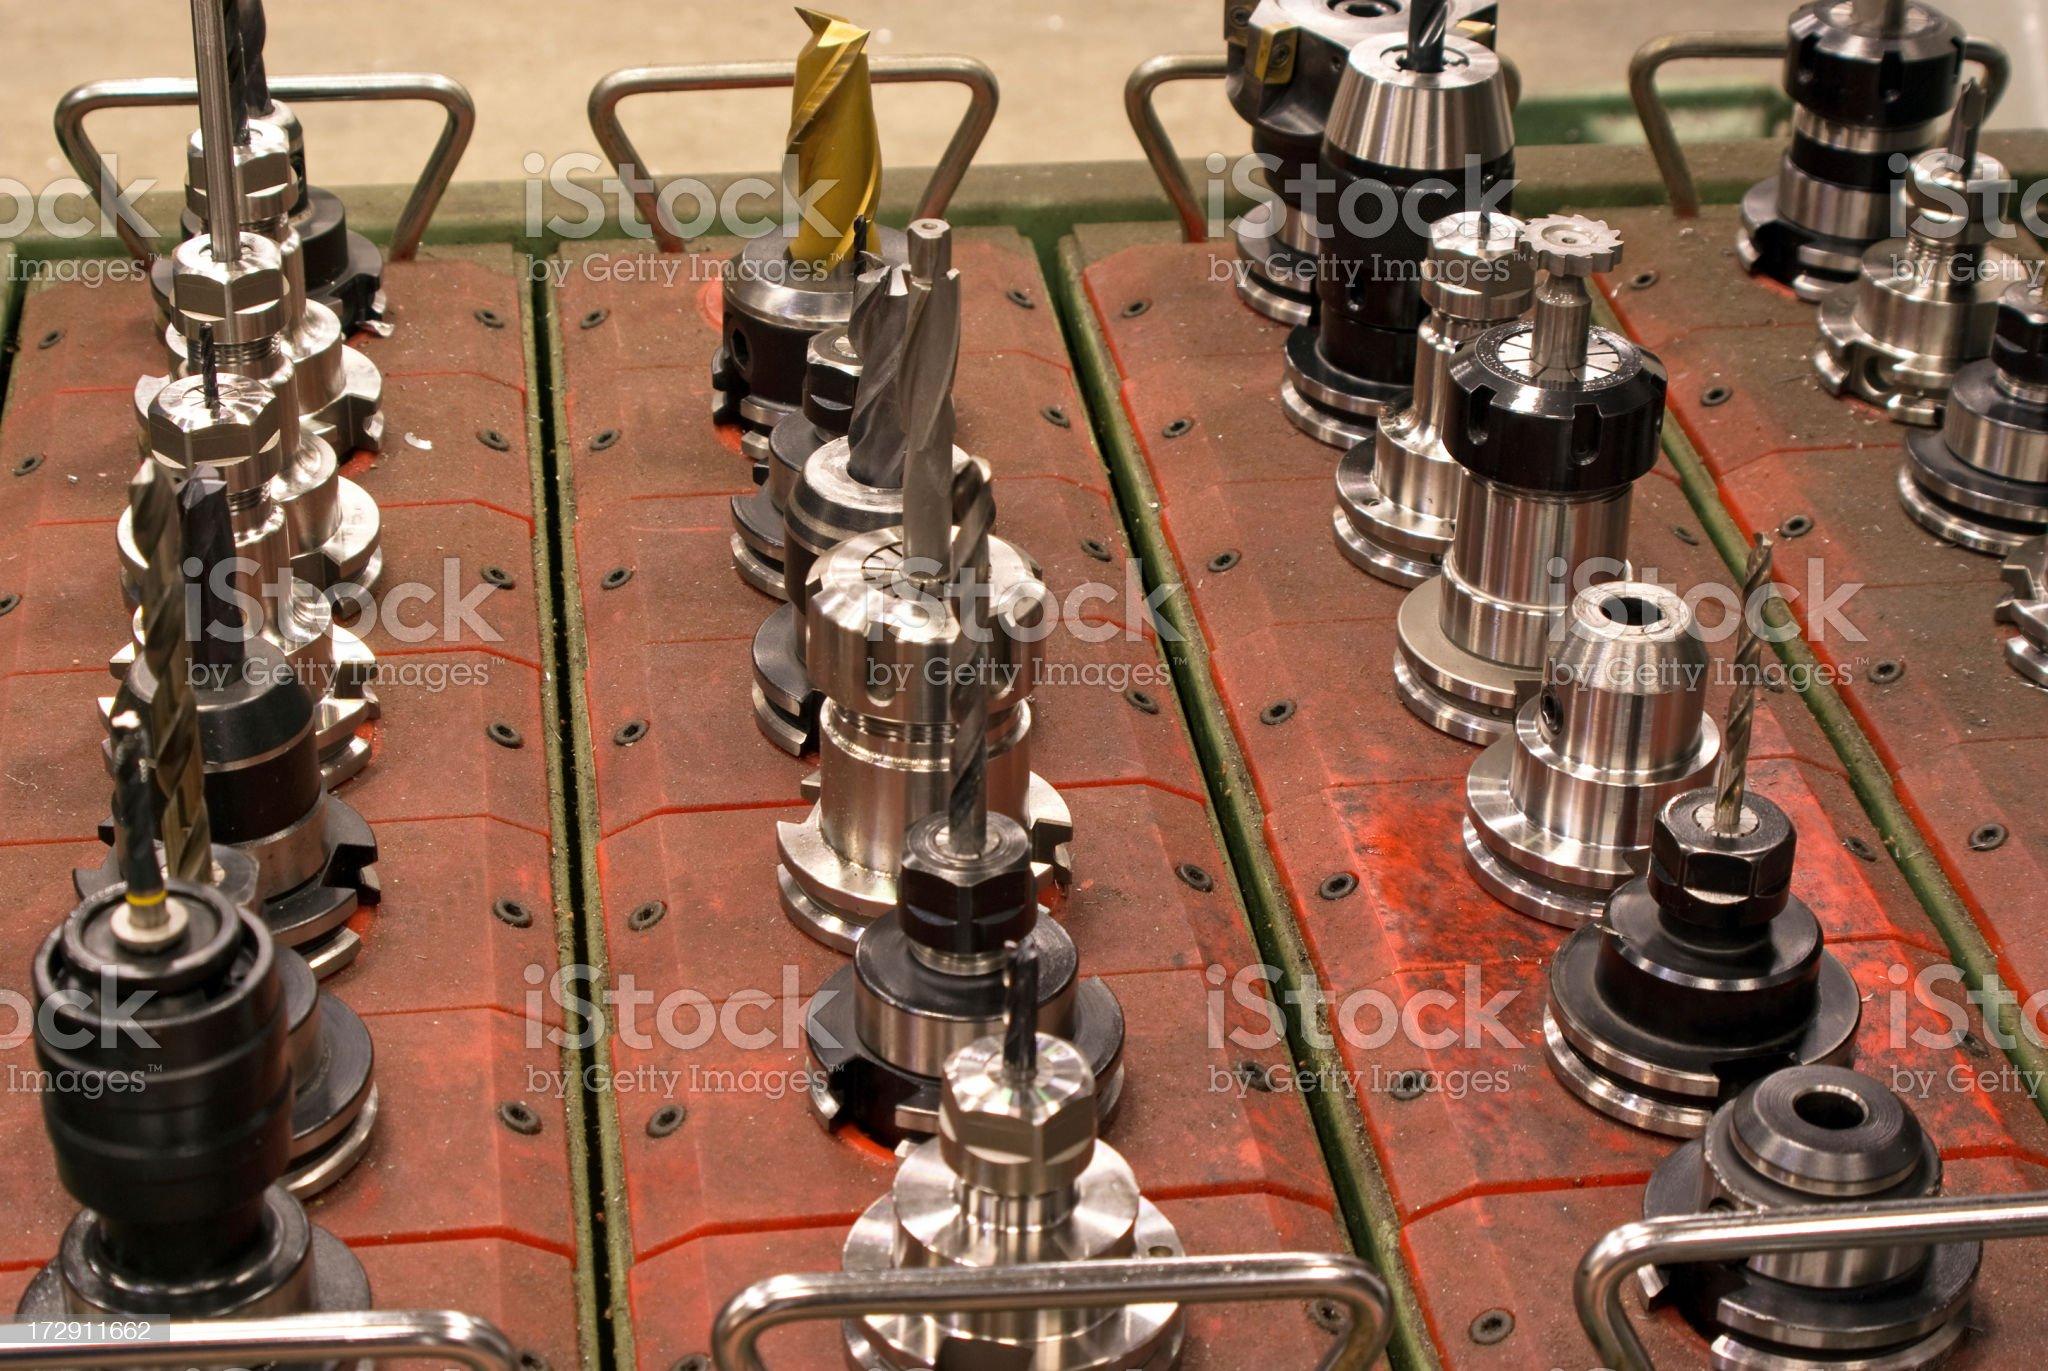 CNC Cutting Tools royalty-free stock photo